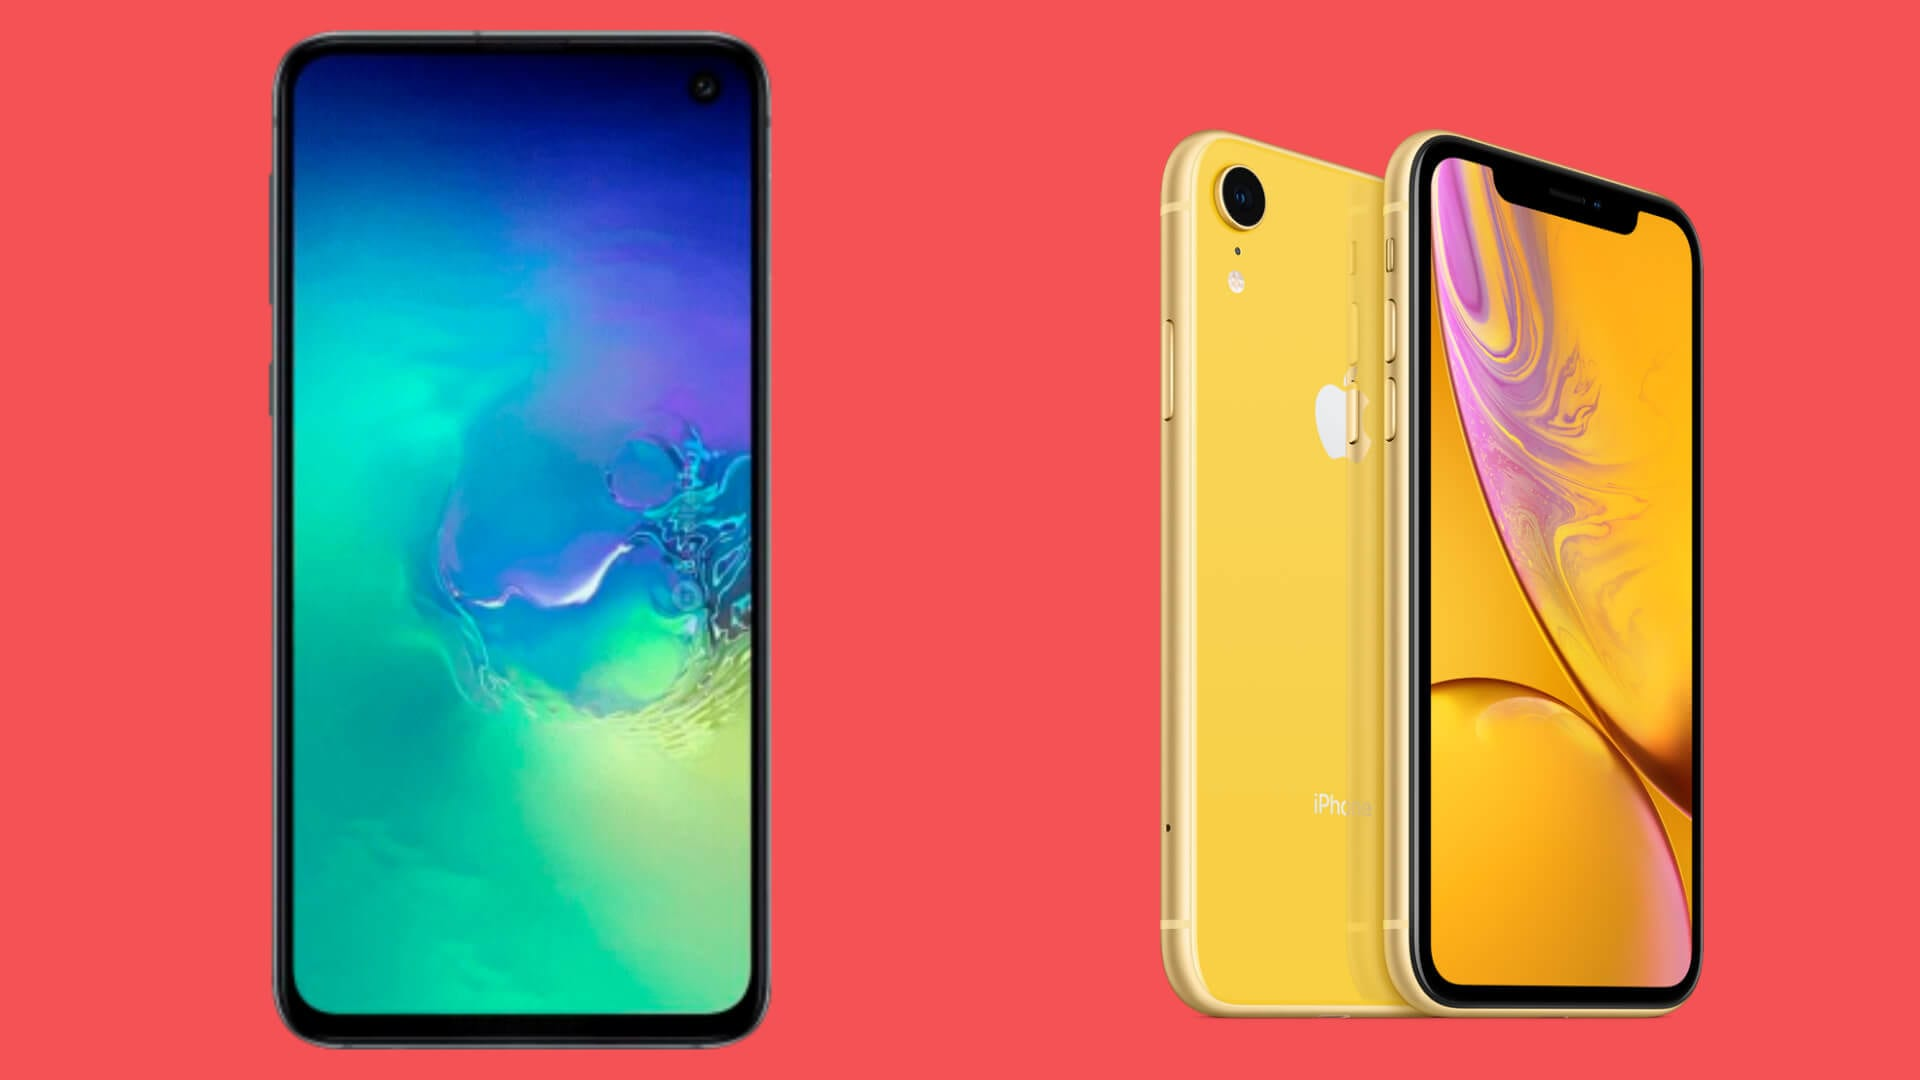 Galaxy s10e v iphone xr